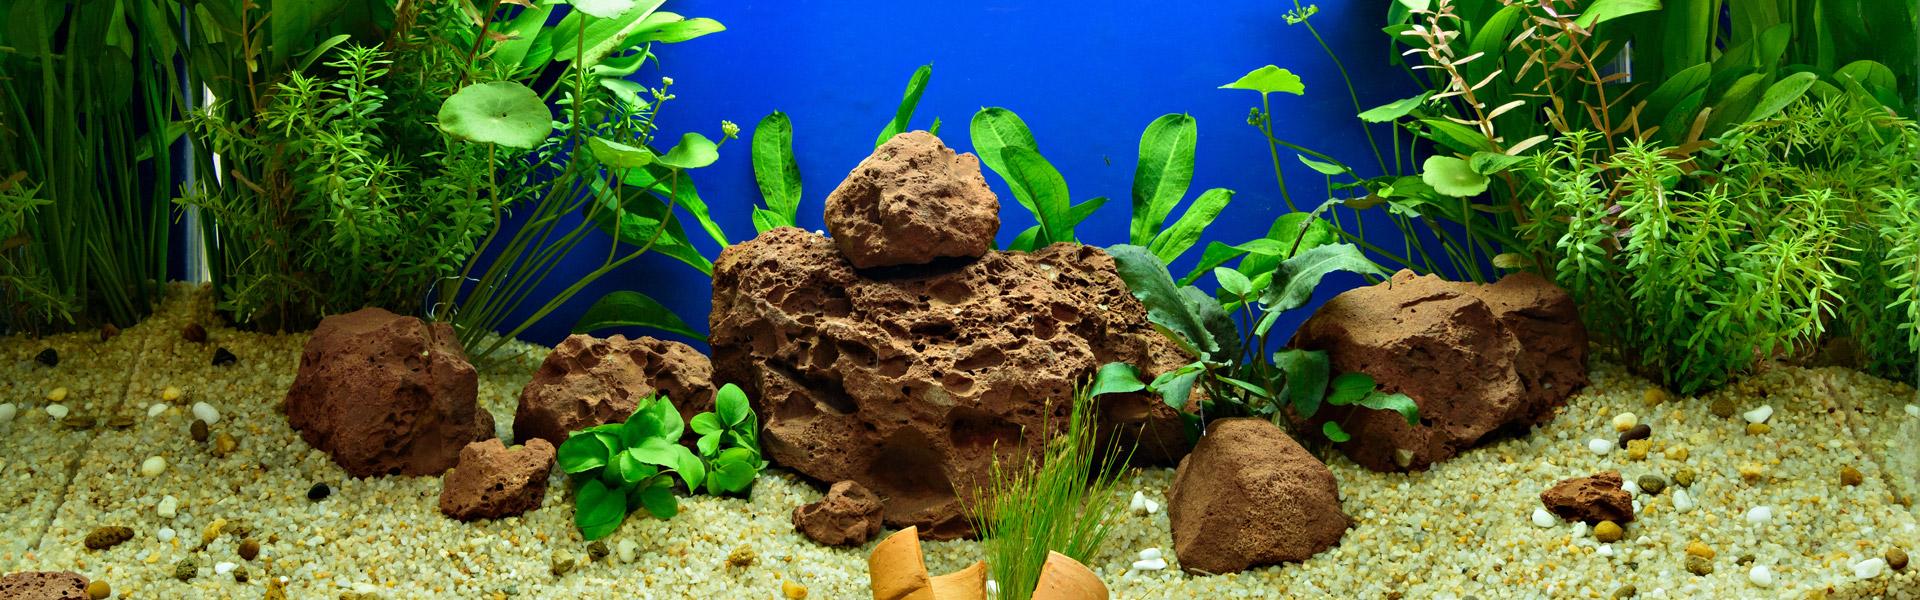 Aquarium Neon  vissen, planten, inrichting van uw aquarium